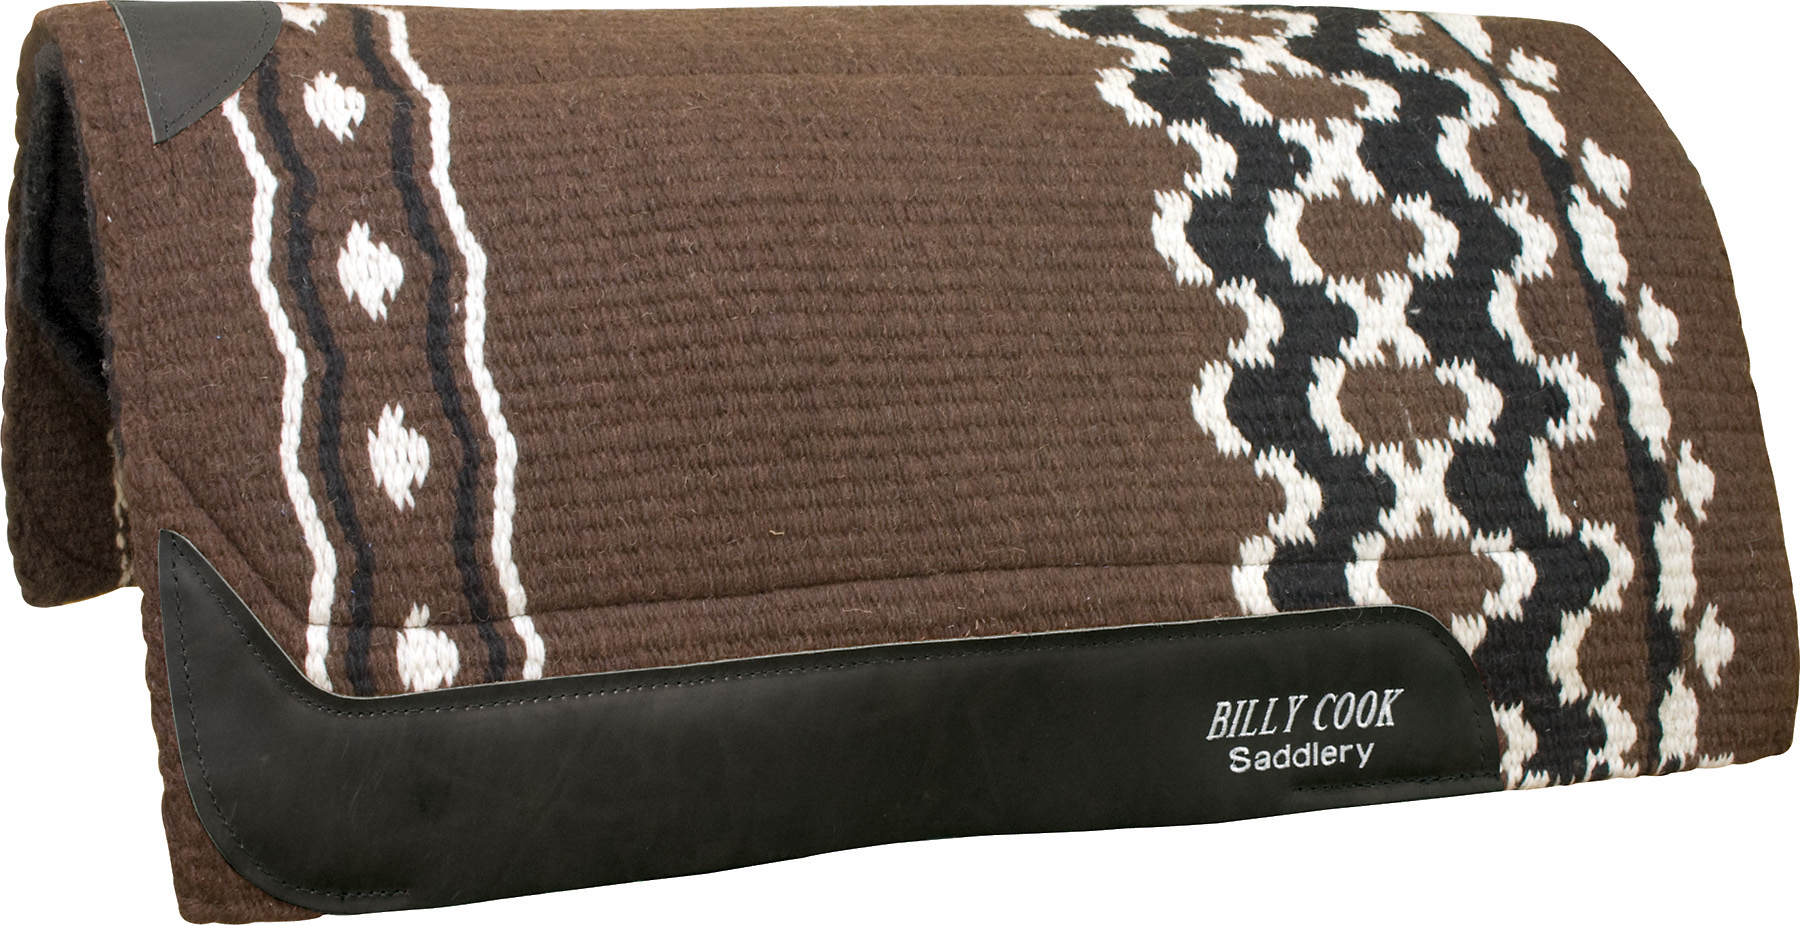 Billy Cook Saddlery VIP Felt Pad